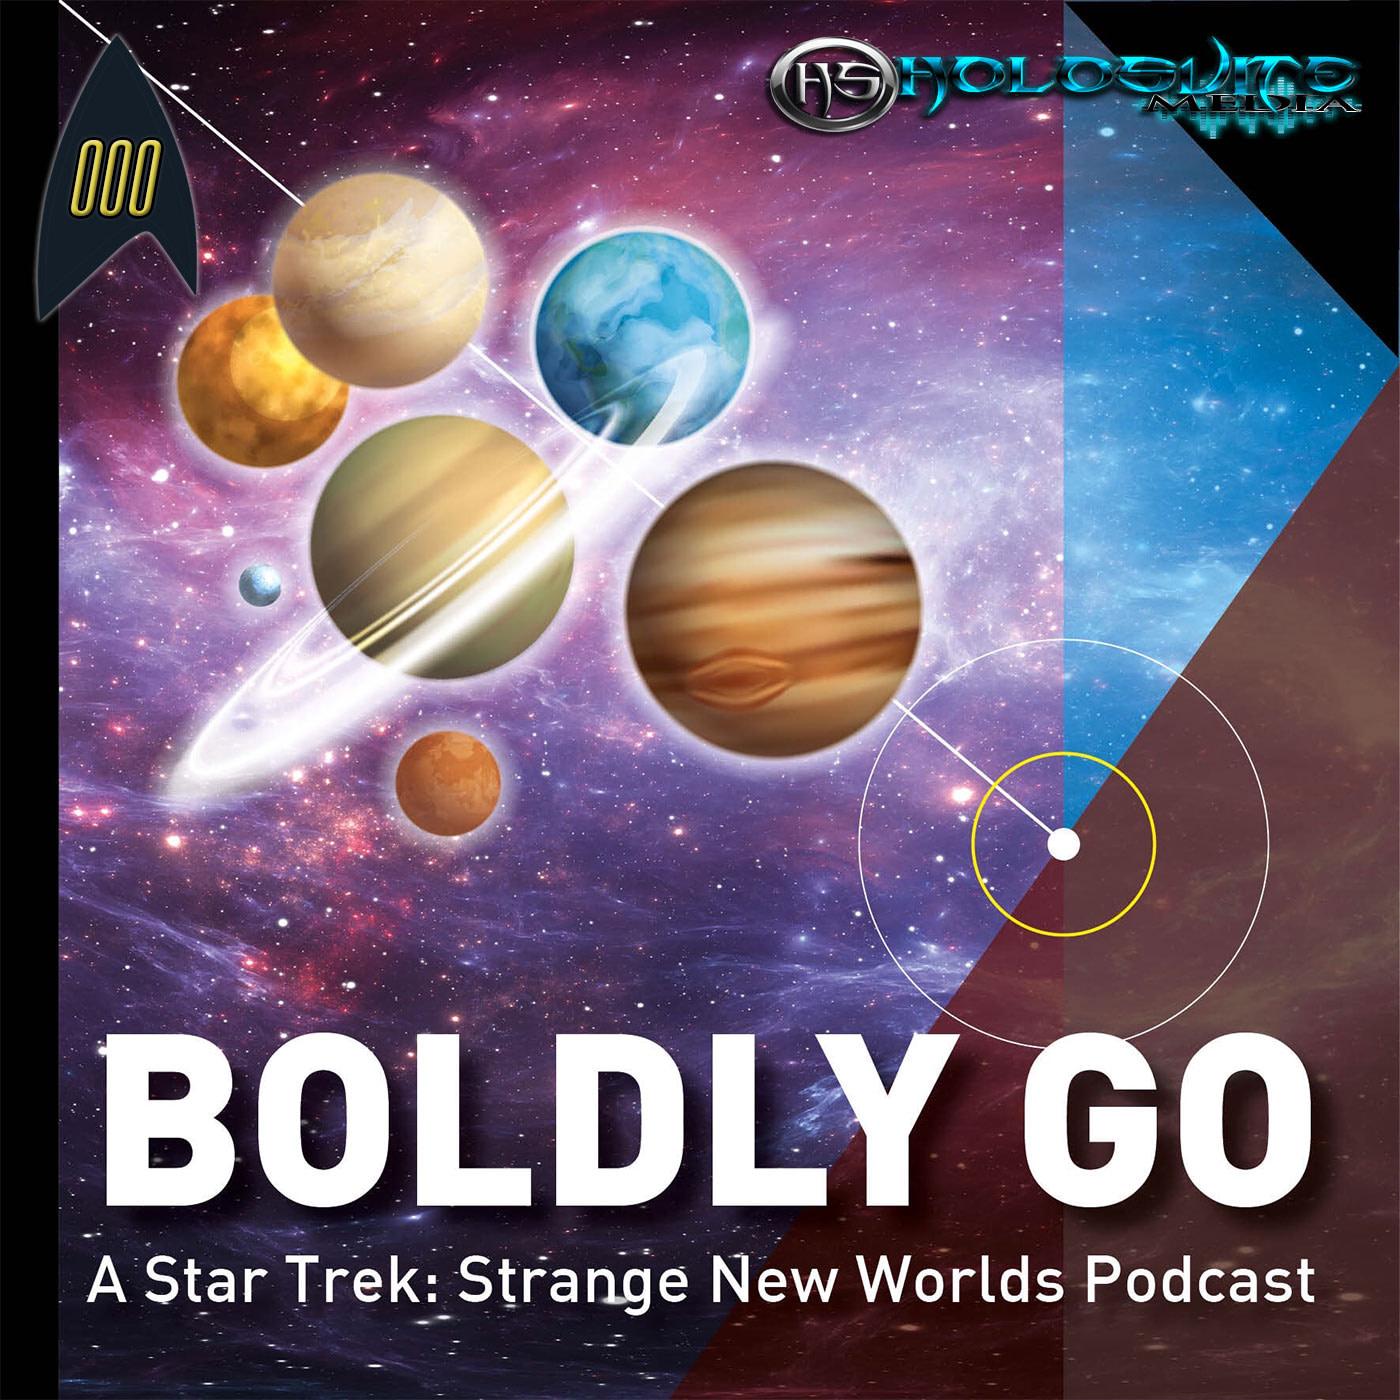 Boldly Go Episode 0